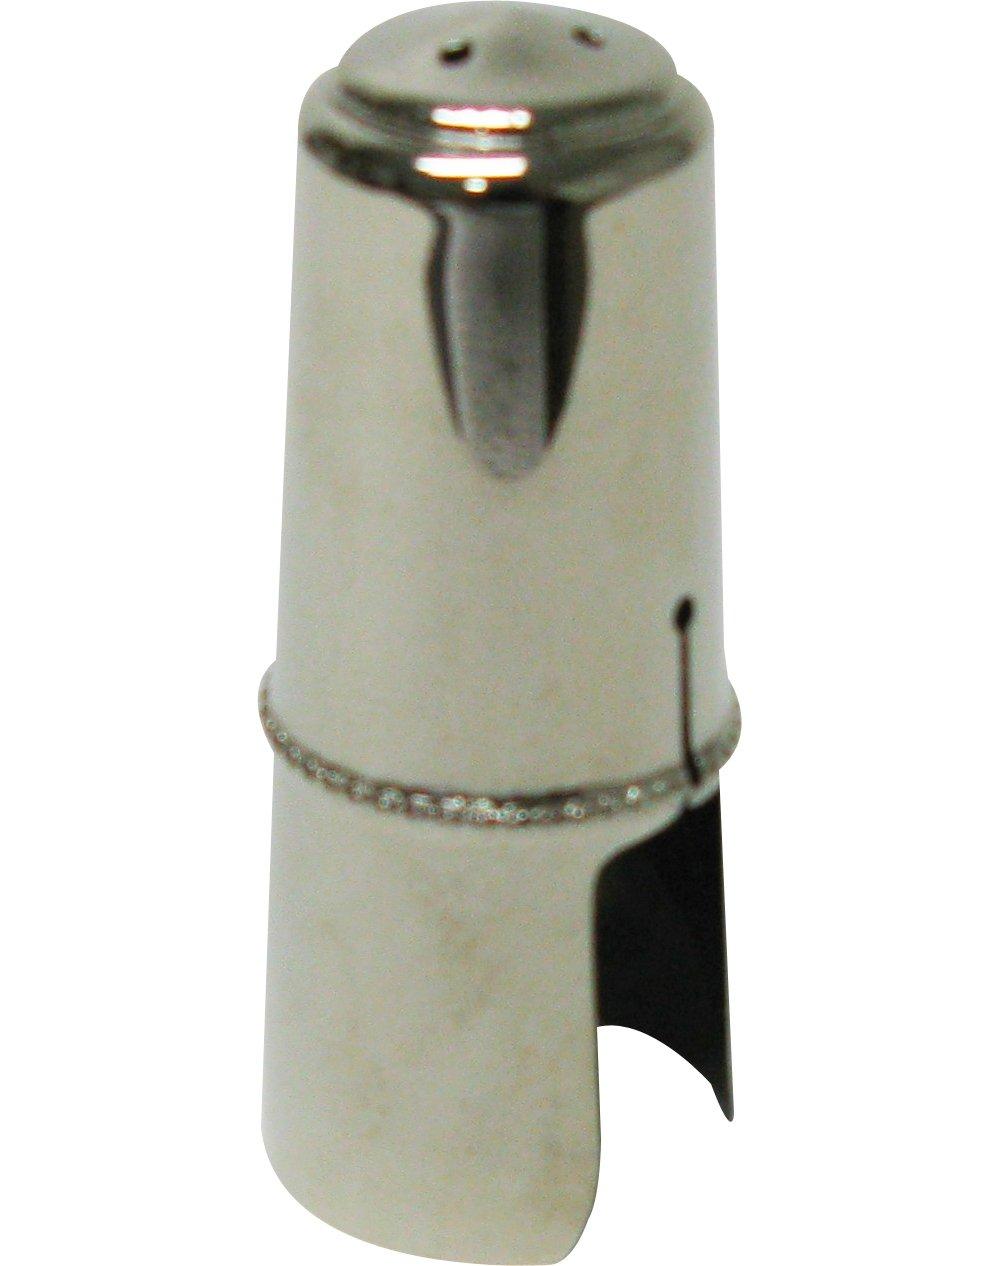 Bonade Alto Saxophone Mouthpiece Cap Nickel Cap Regular